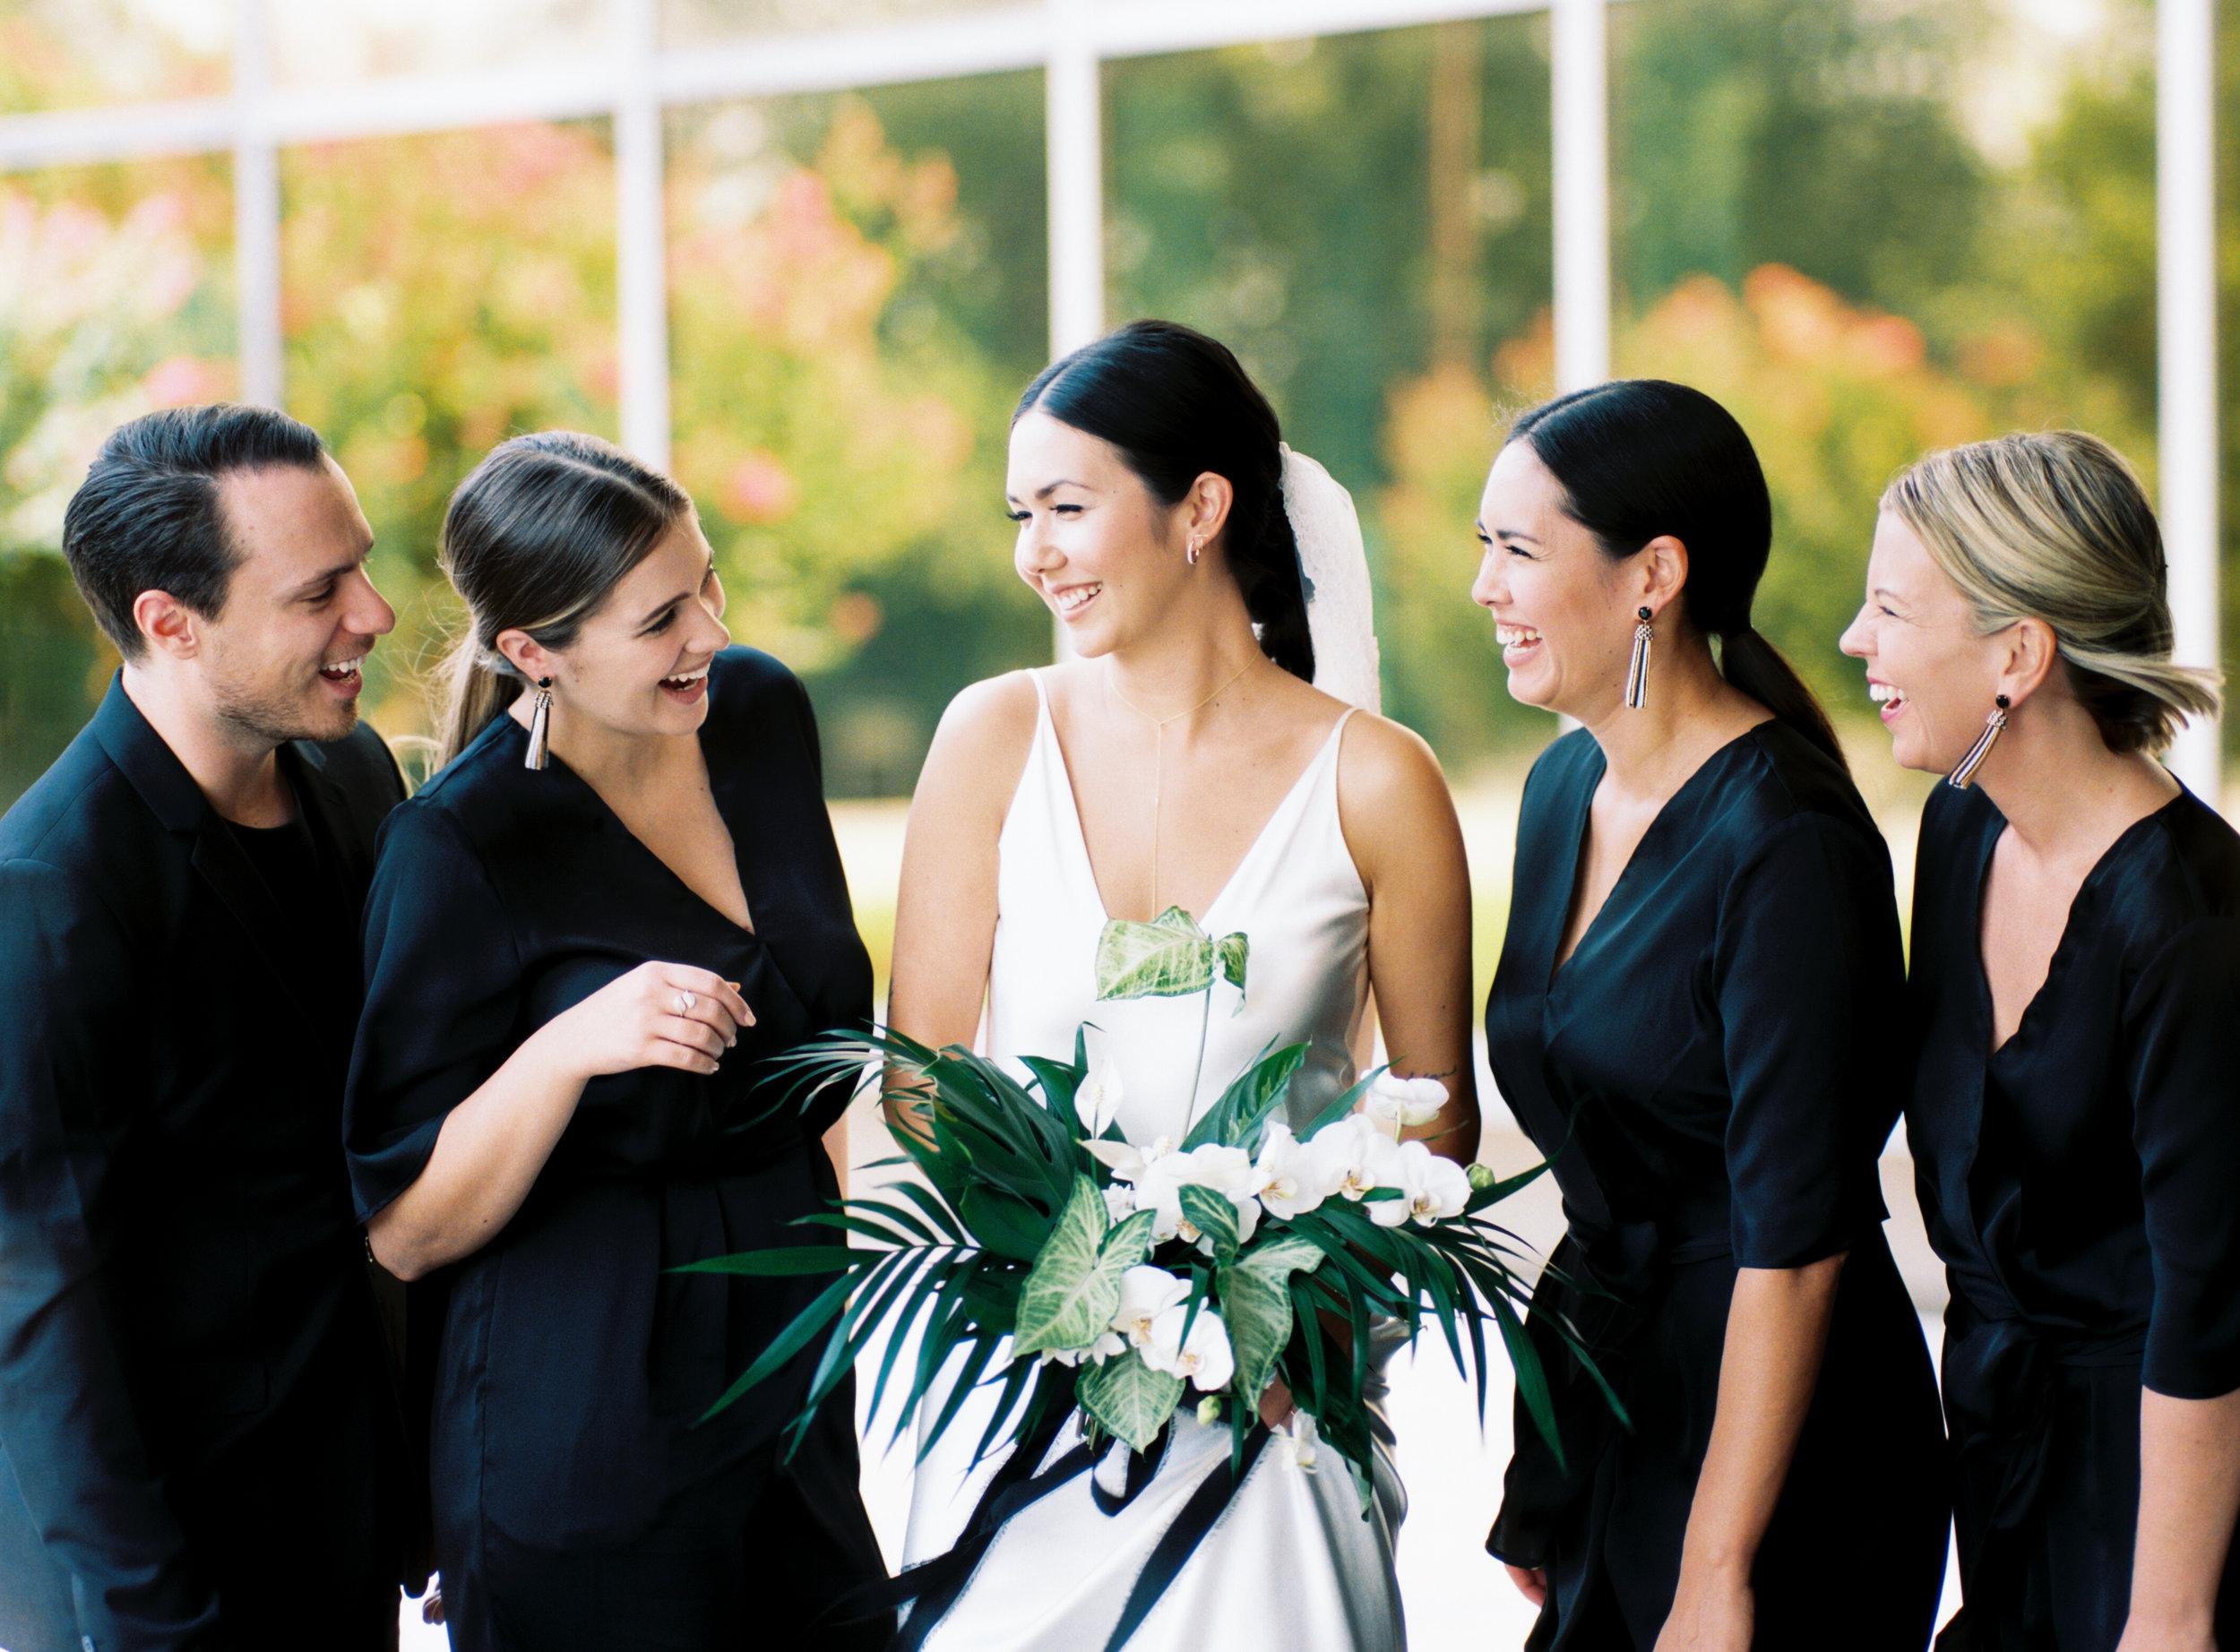 bridesmaids-jumpsuits.jpg